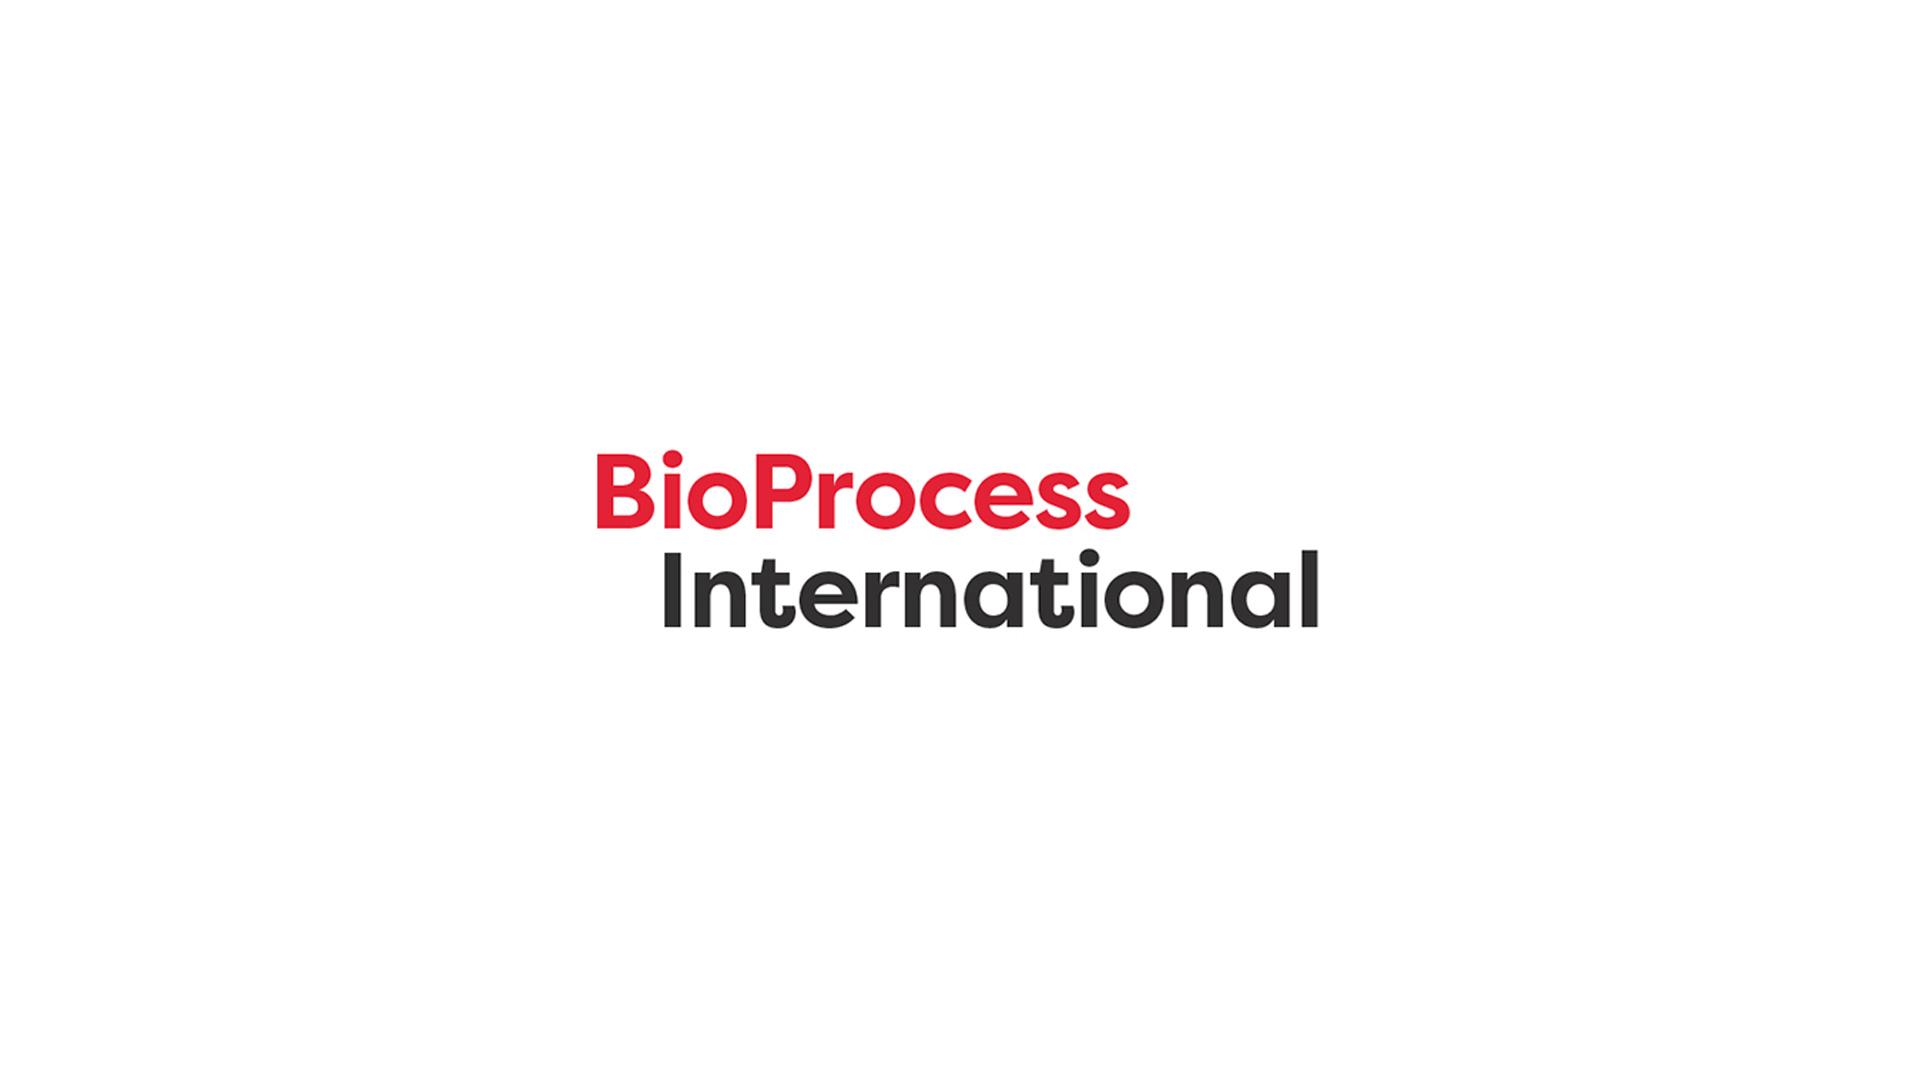 TreeFrog's CTO interviewed by BioProcess International